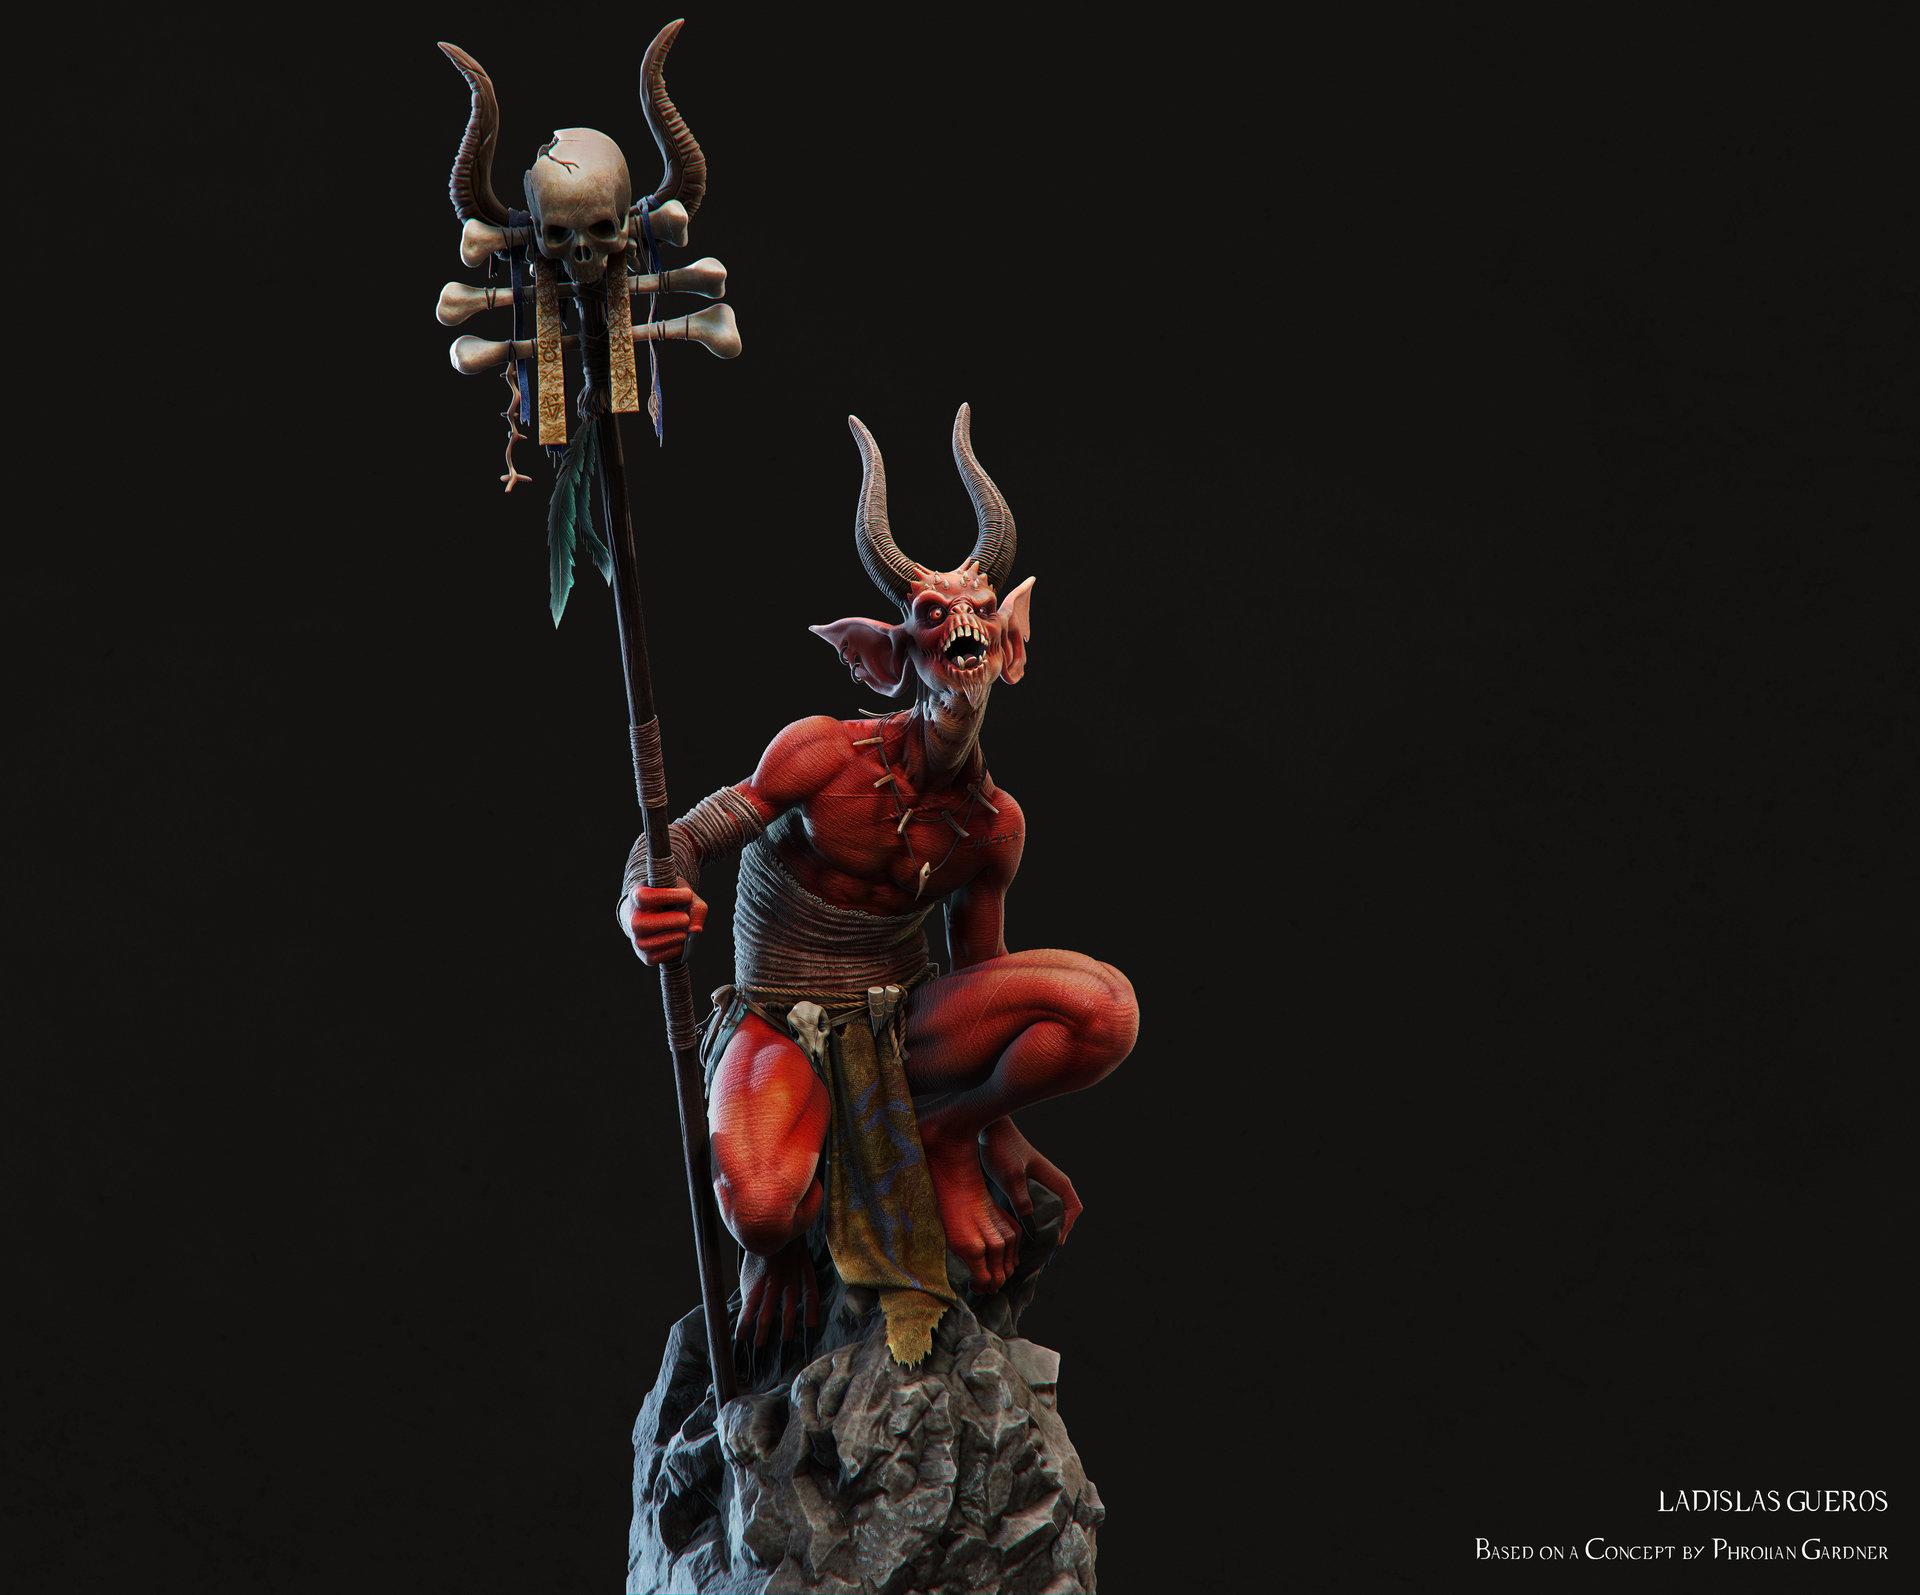 Ladislas gueros shaman def new